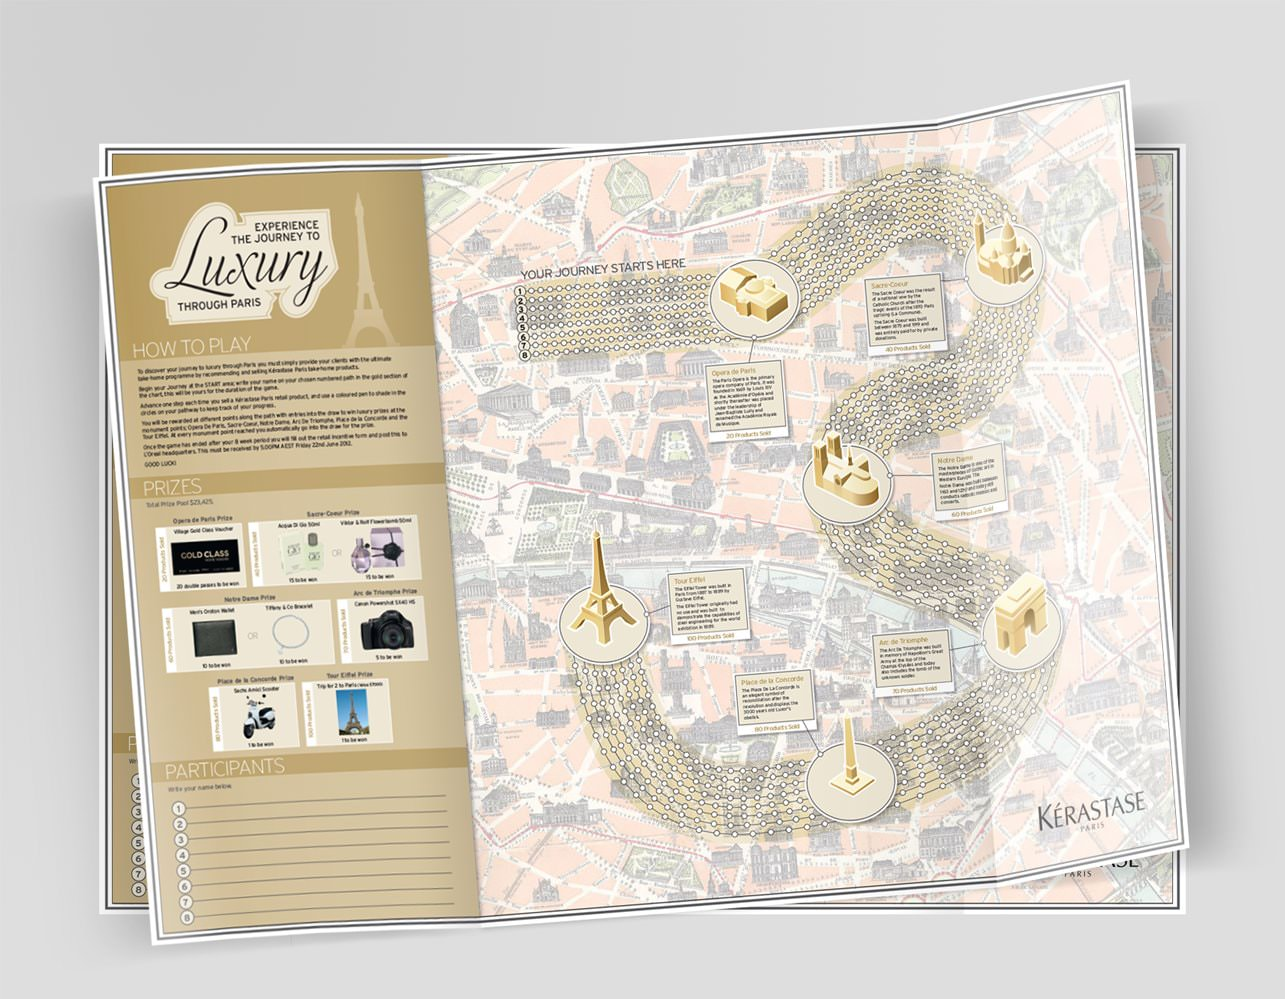 DJW_Folio_Kerastase-GameBoard-Inside-Angled